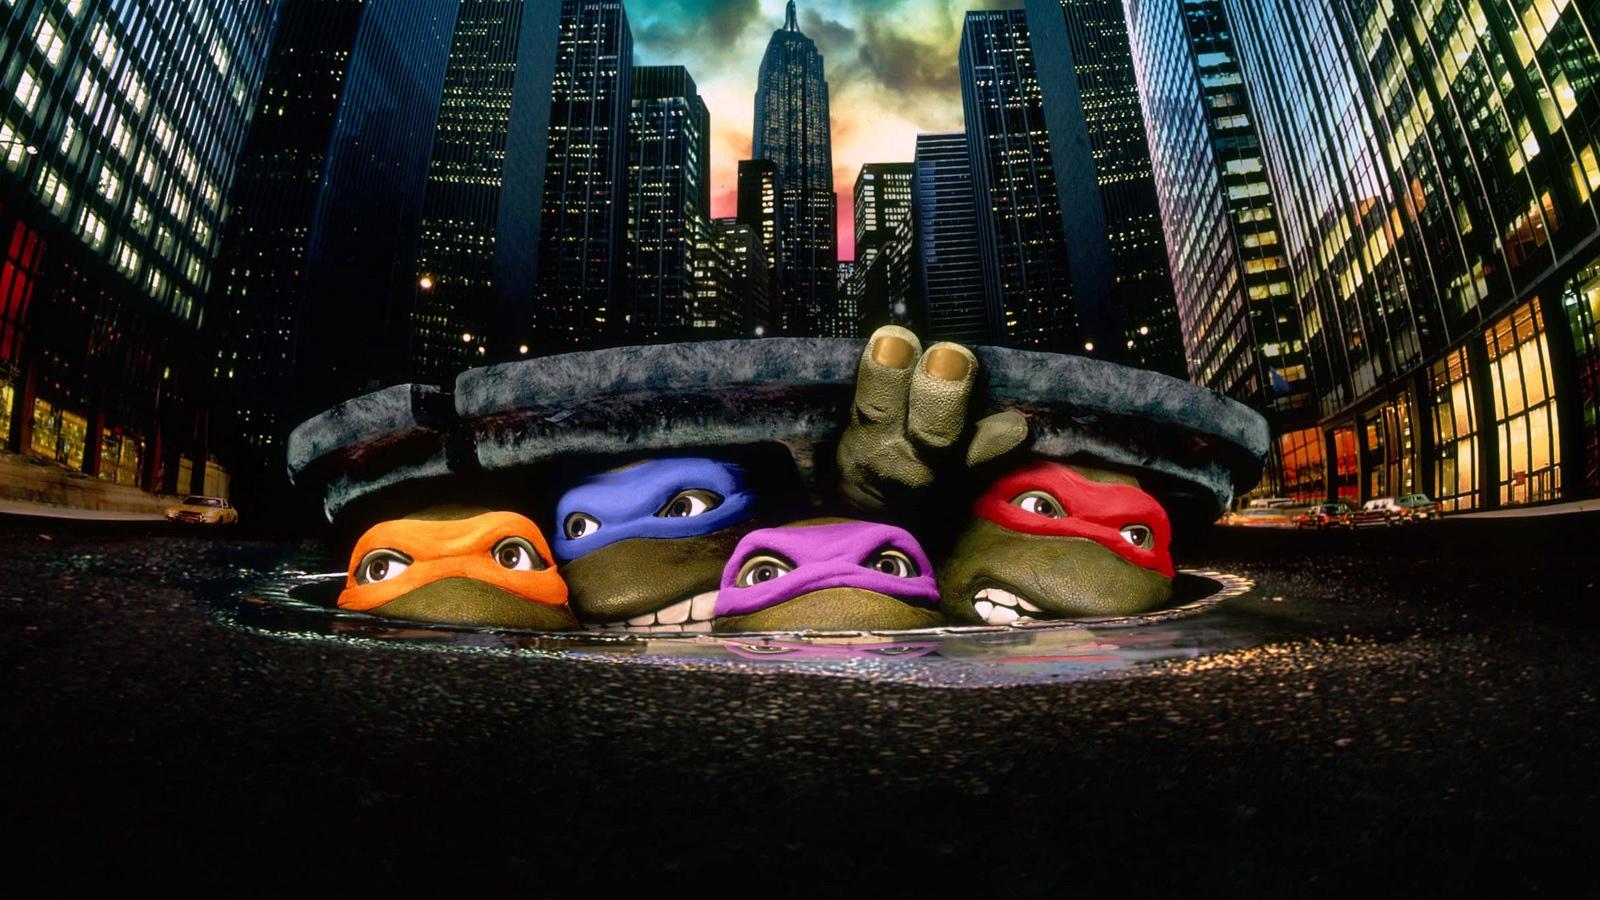 Teenage Mutant Ninja Turtles images The Big City HD wallpaper and background photos